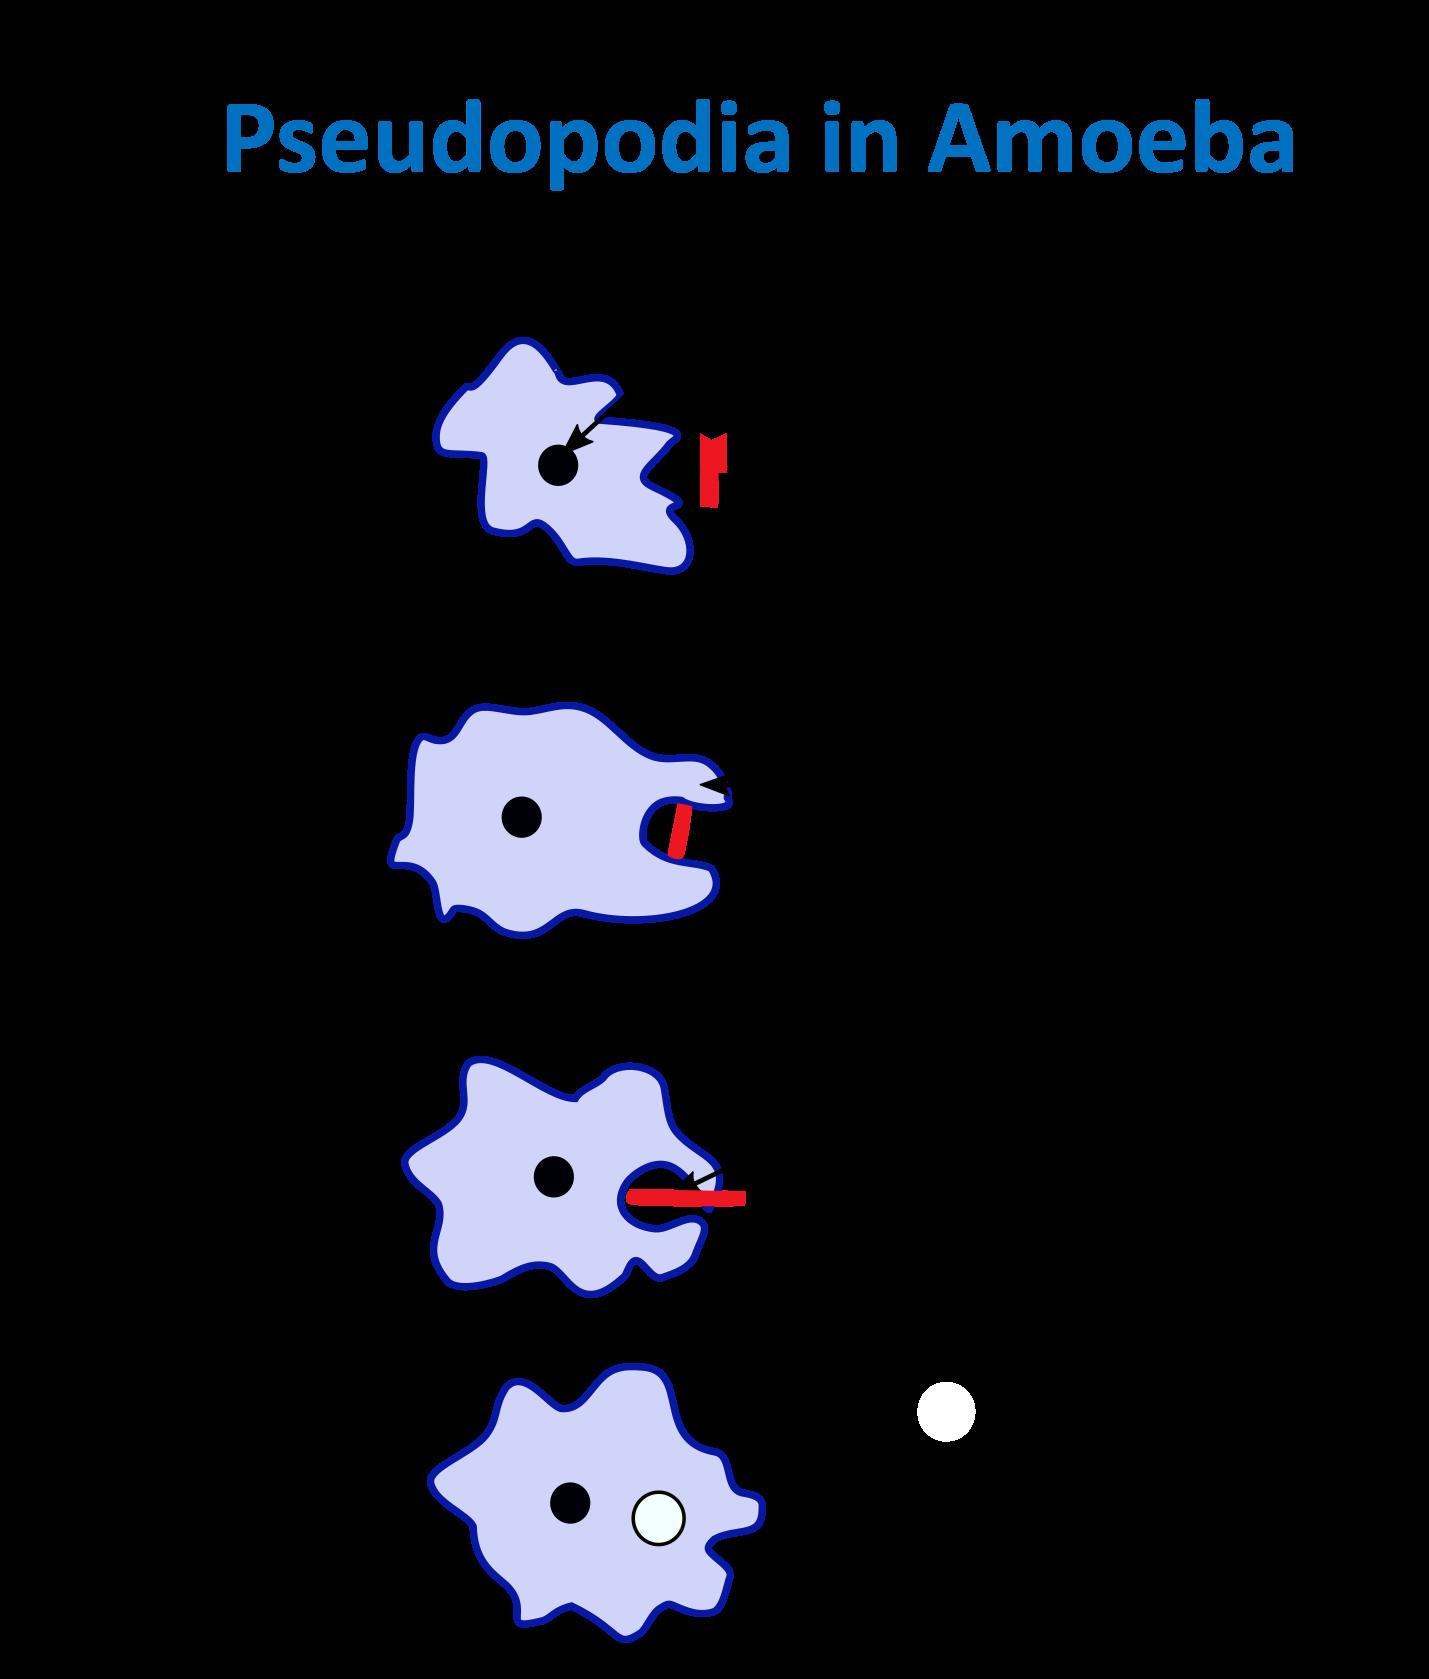 Pseudopodia in Amoeba.png